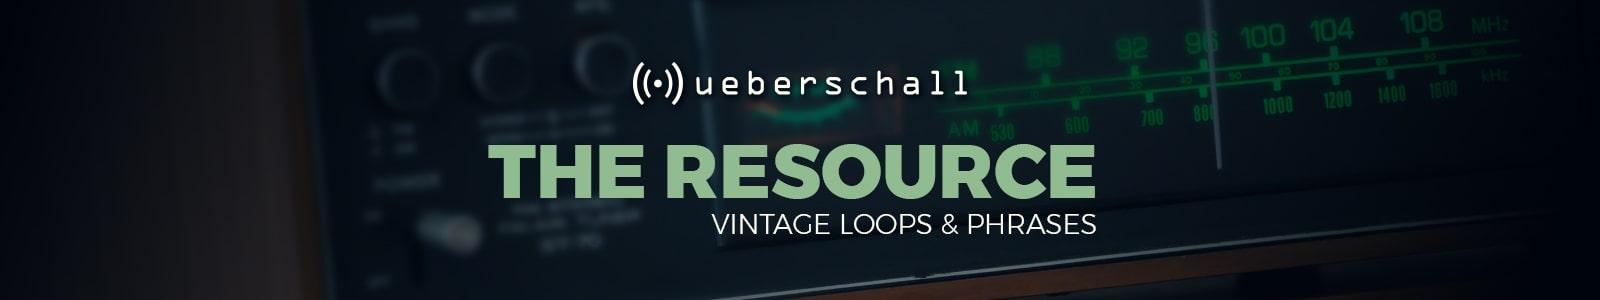 TH RESOURCE BY UEBERSCHALL